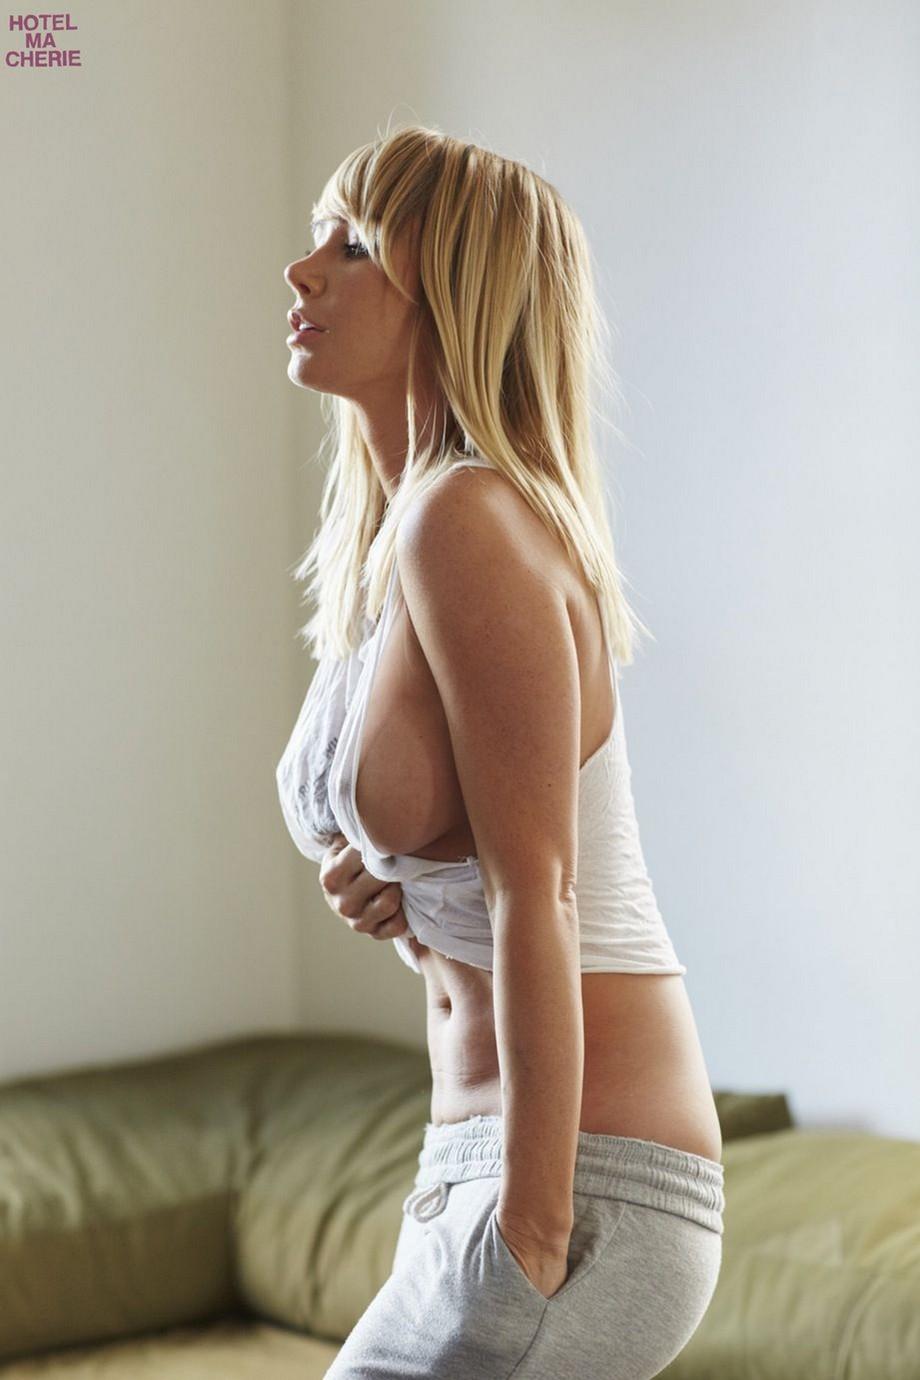 Sara jean underwood nude gif